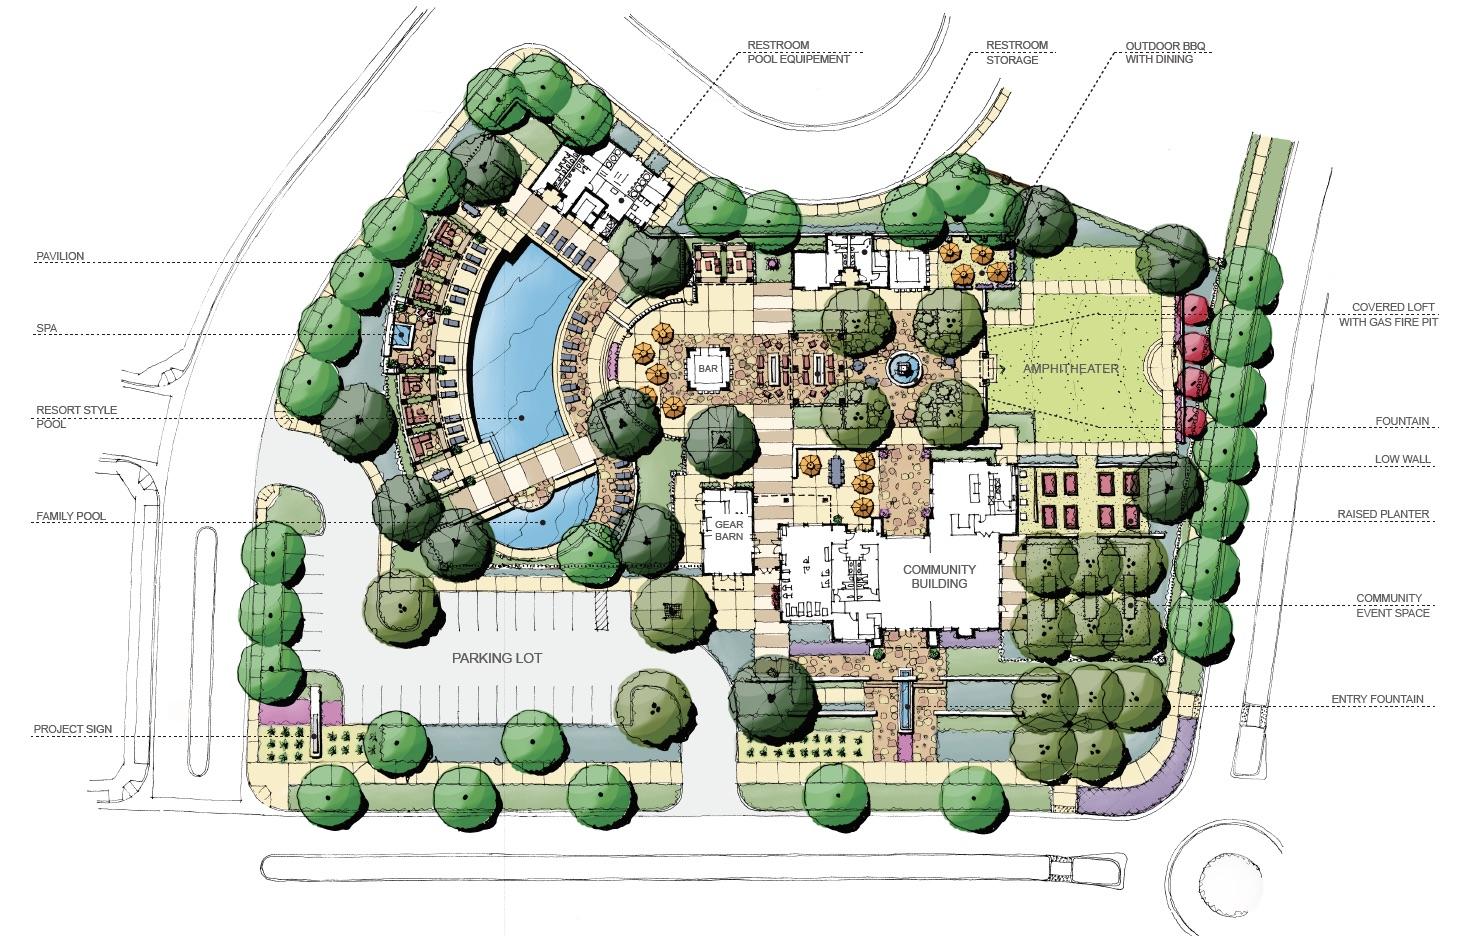 Riverstone REC Concept.jpg